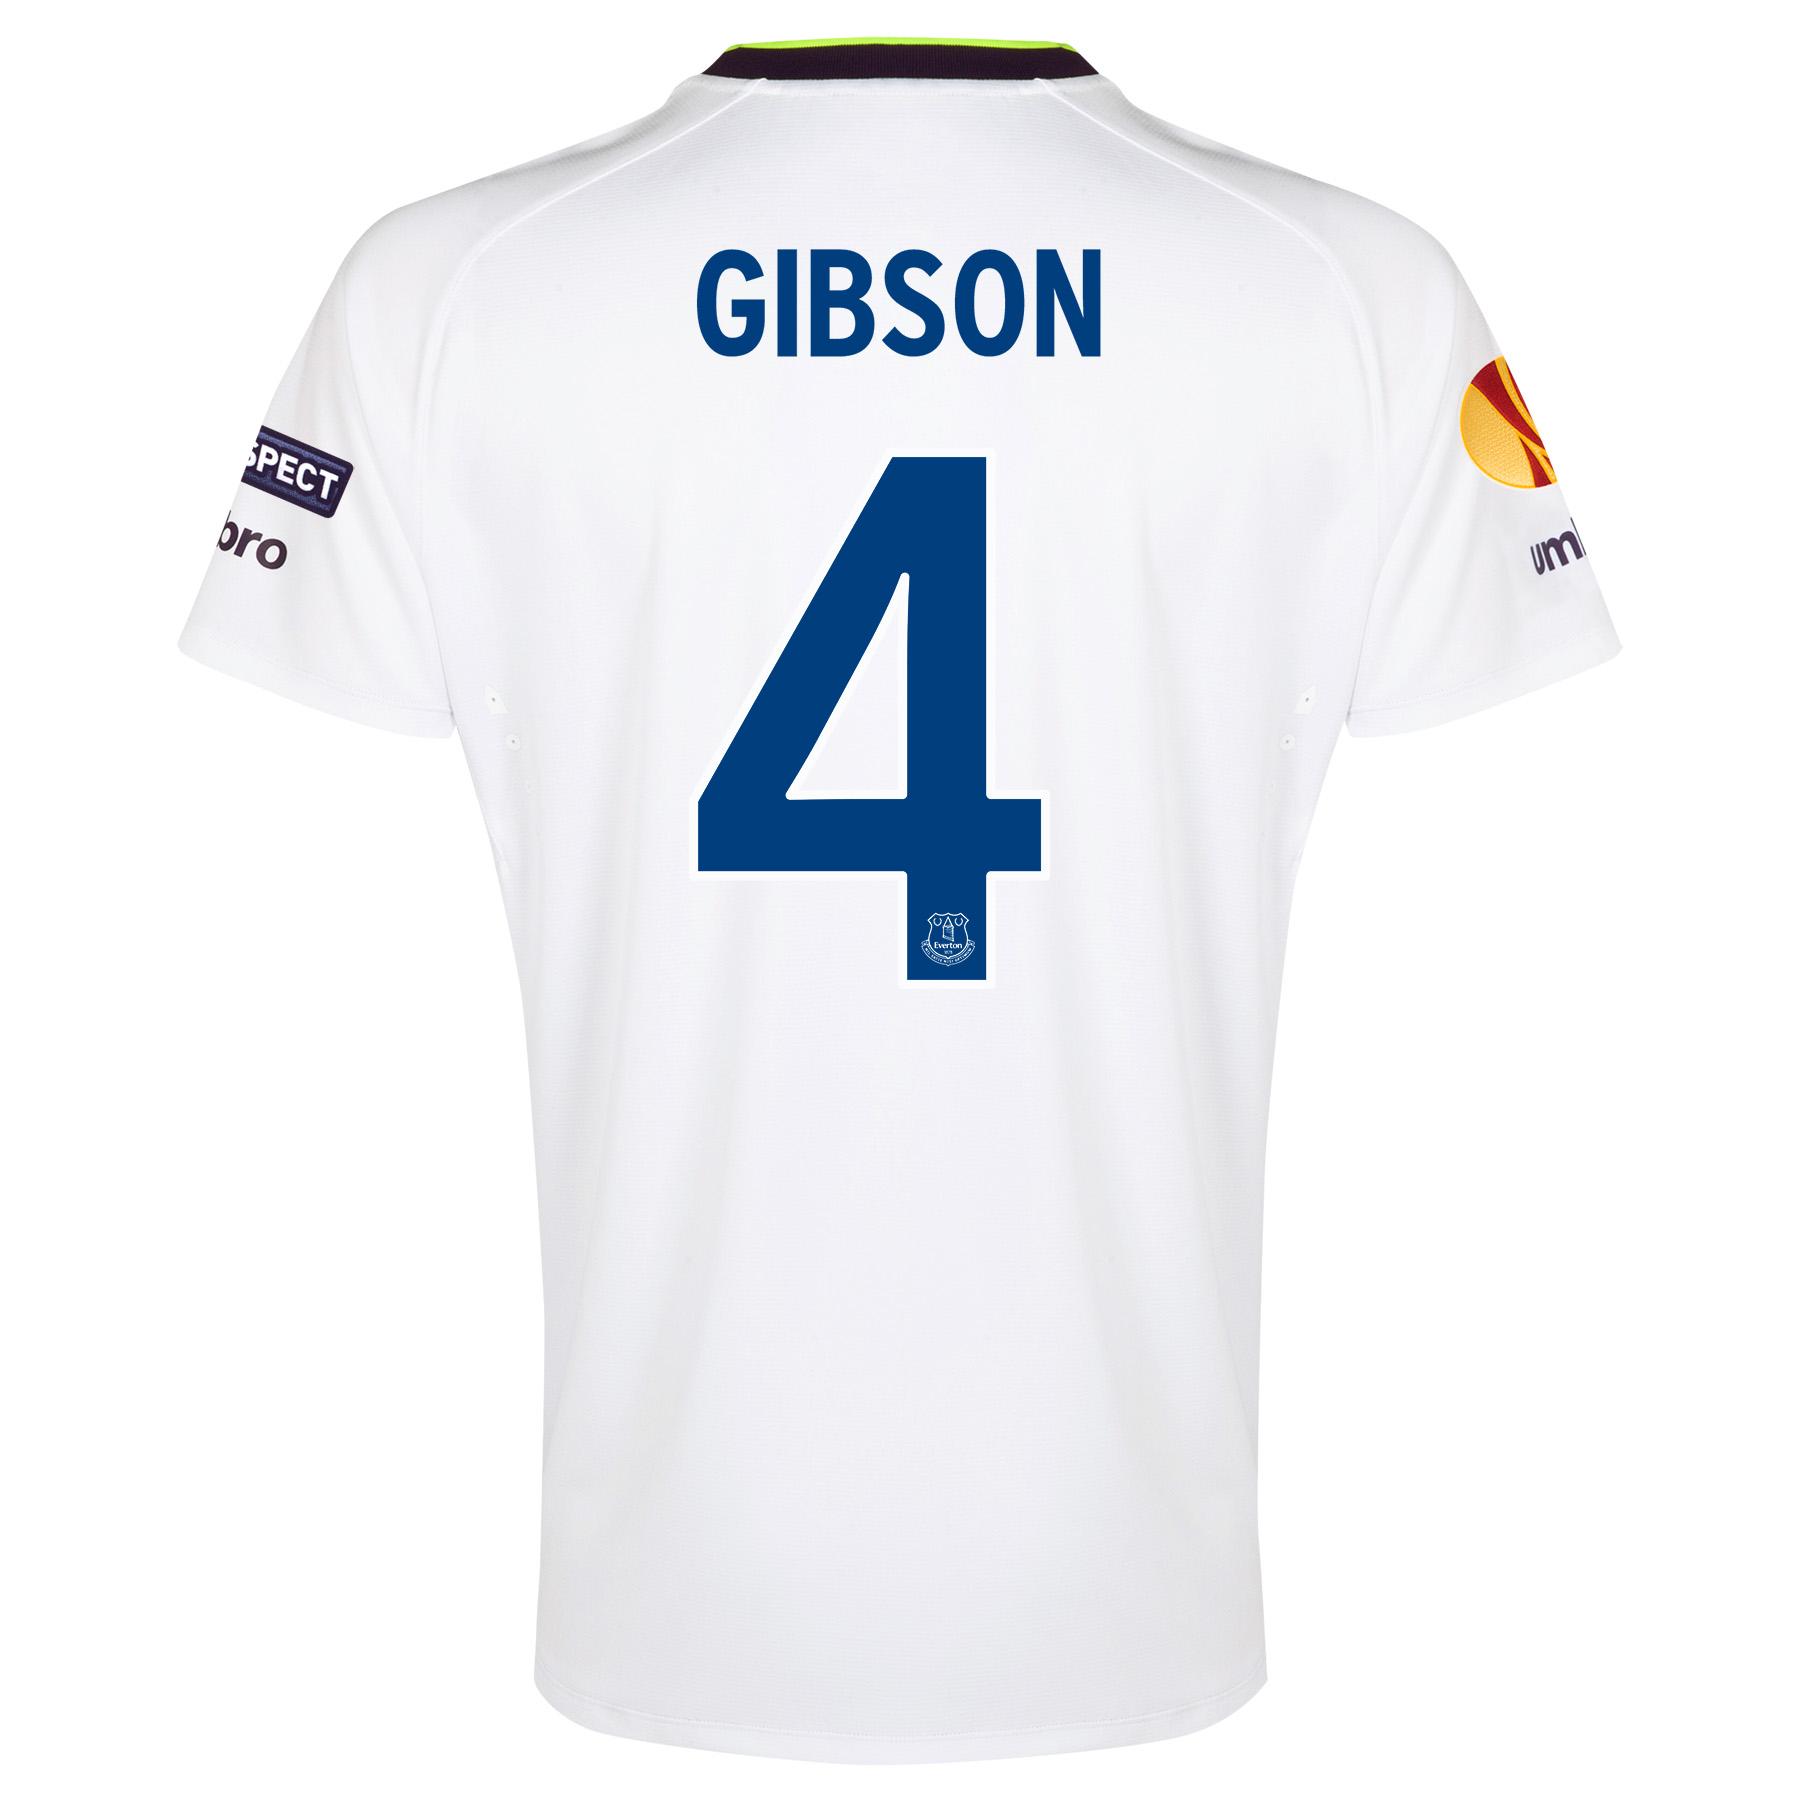 Everton UEFA Europa League 3rd Shirt 2014/15 - Junior with Gibson 4 printing